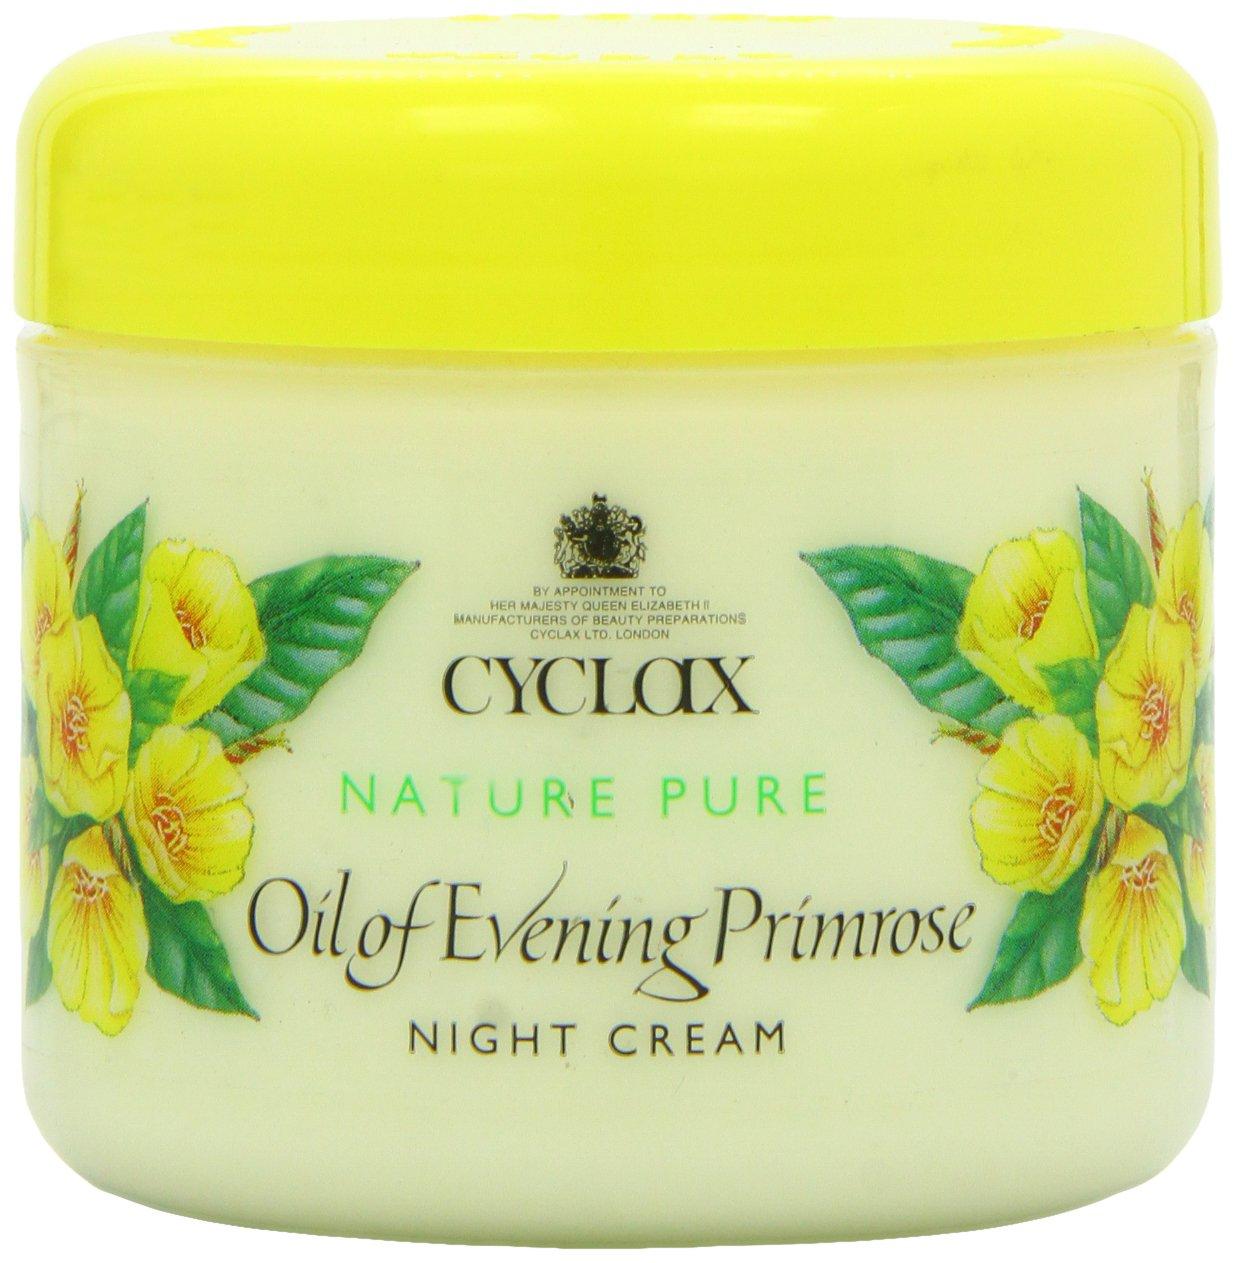 Cyclax Oil of Evening Primrose Night Cream 300ml GroceryCentre 000787